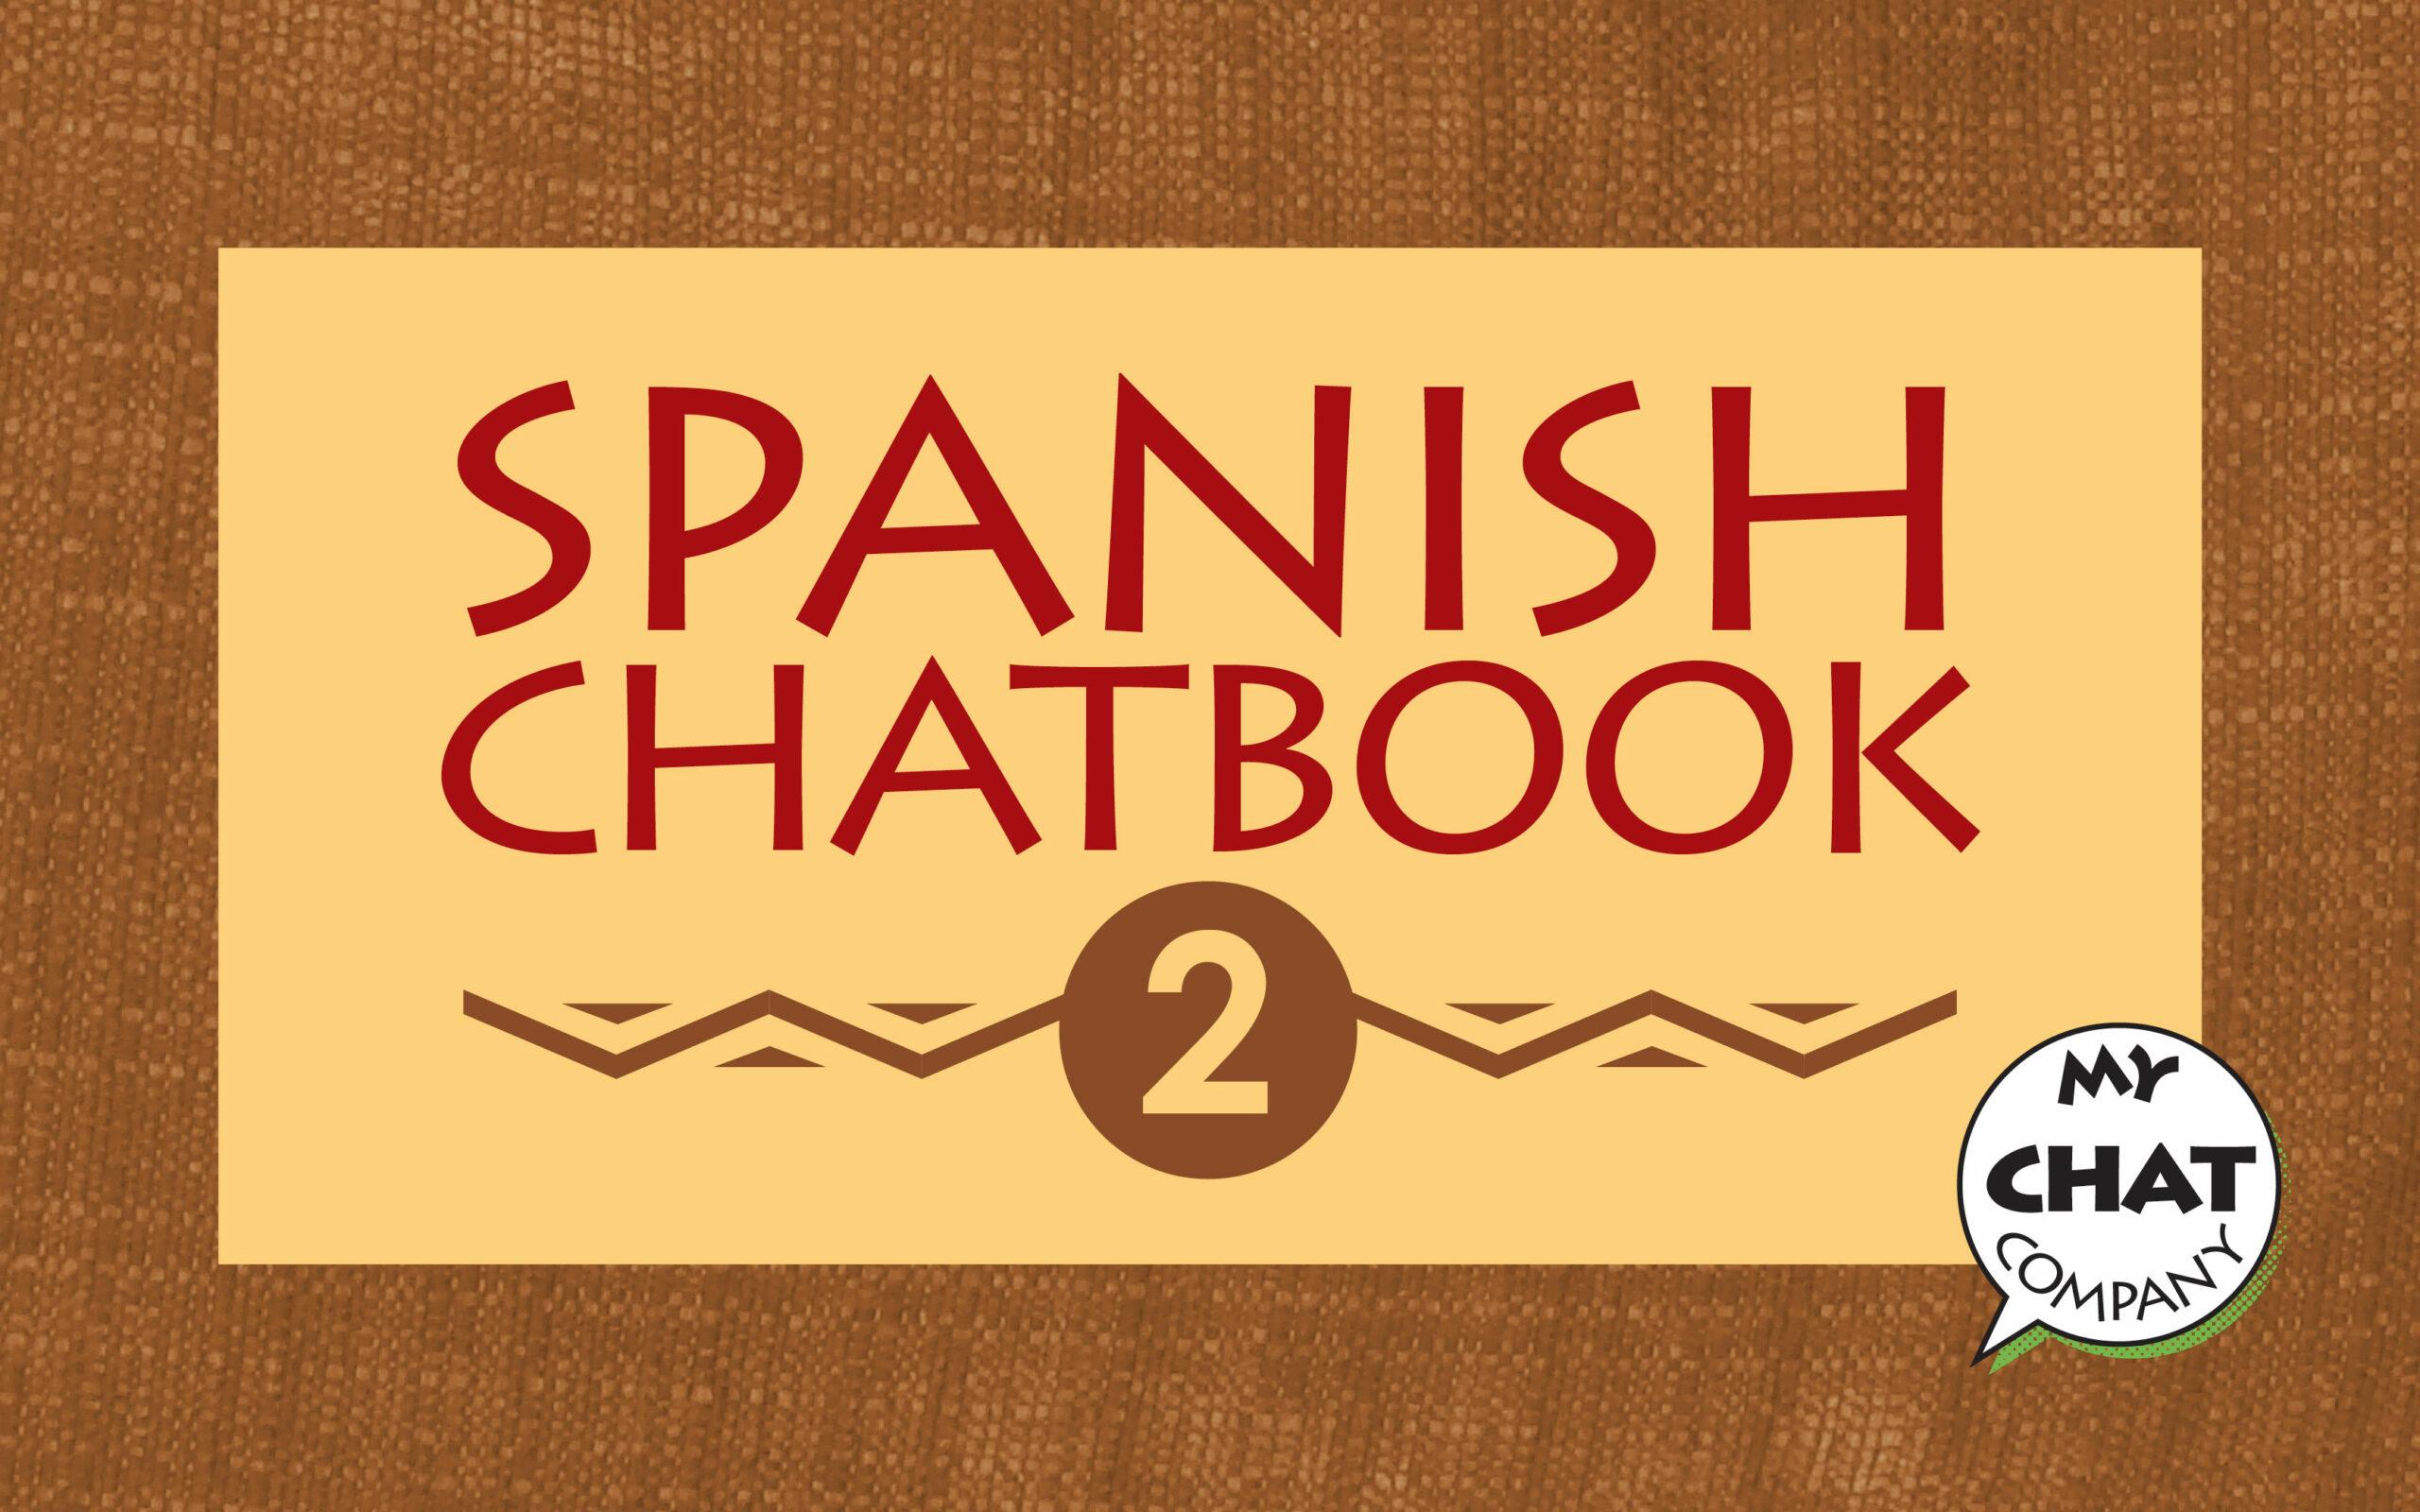 Spanish Chatbook 2